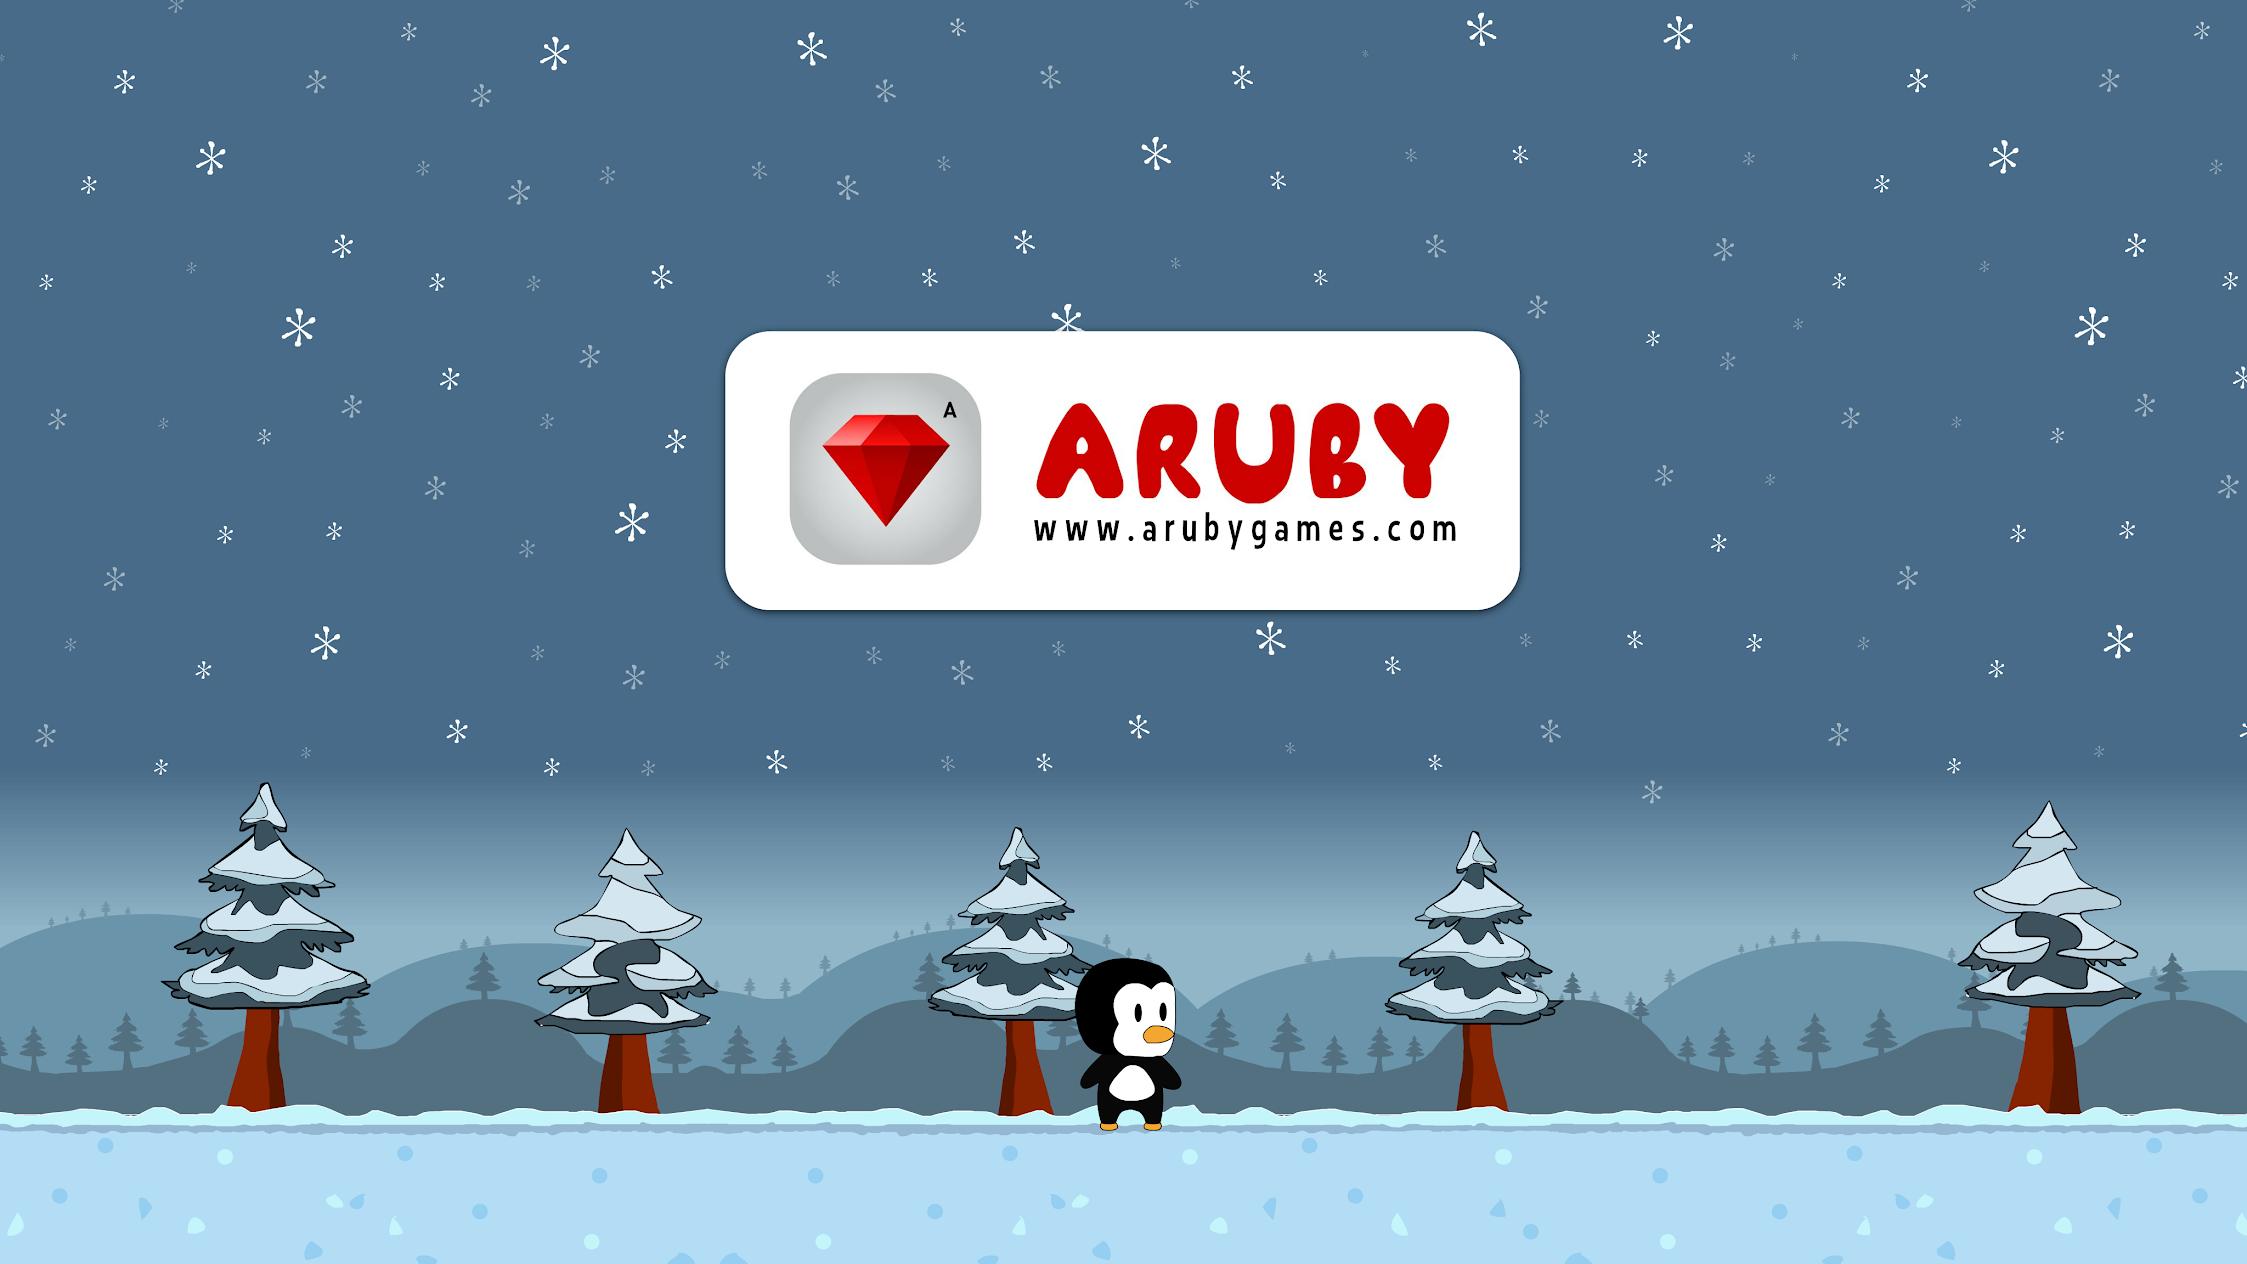 ARUBY Games